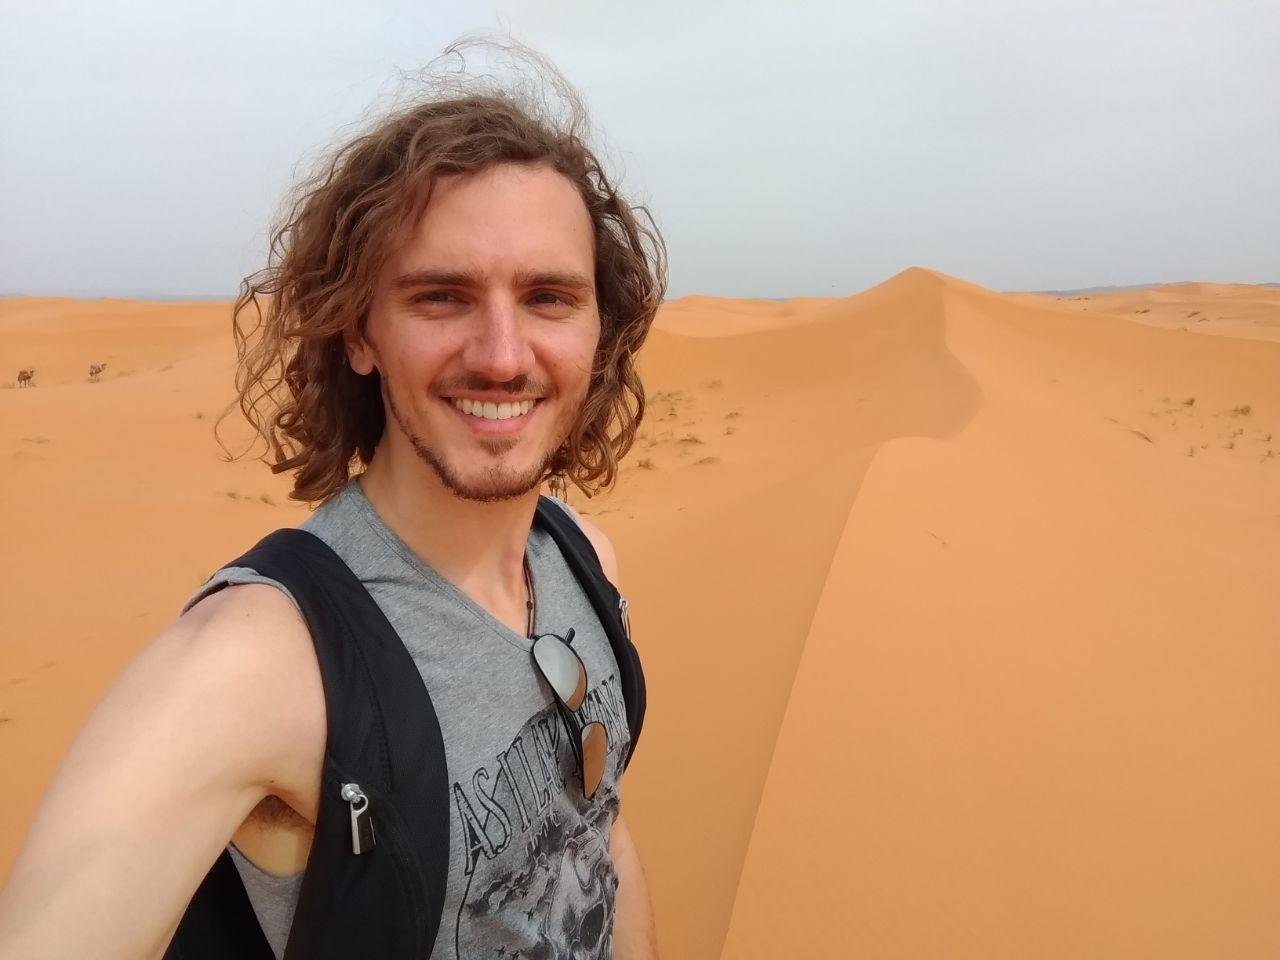 Matt, the world traveler